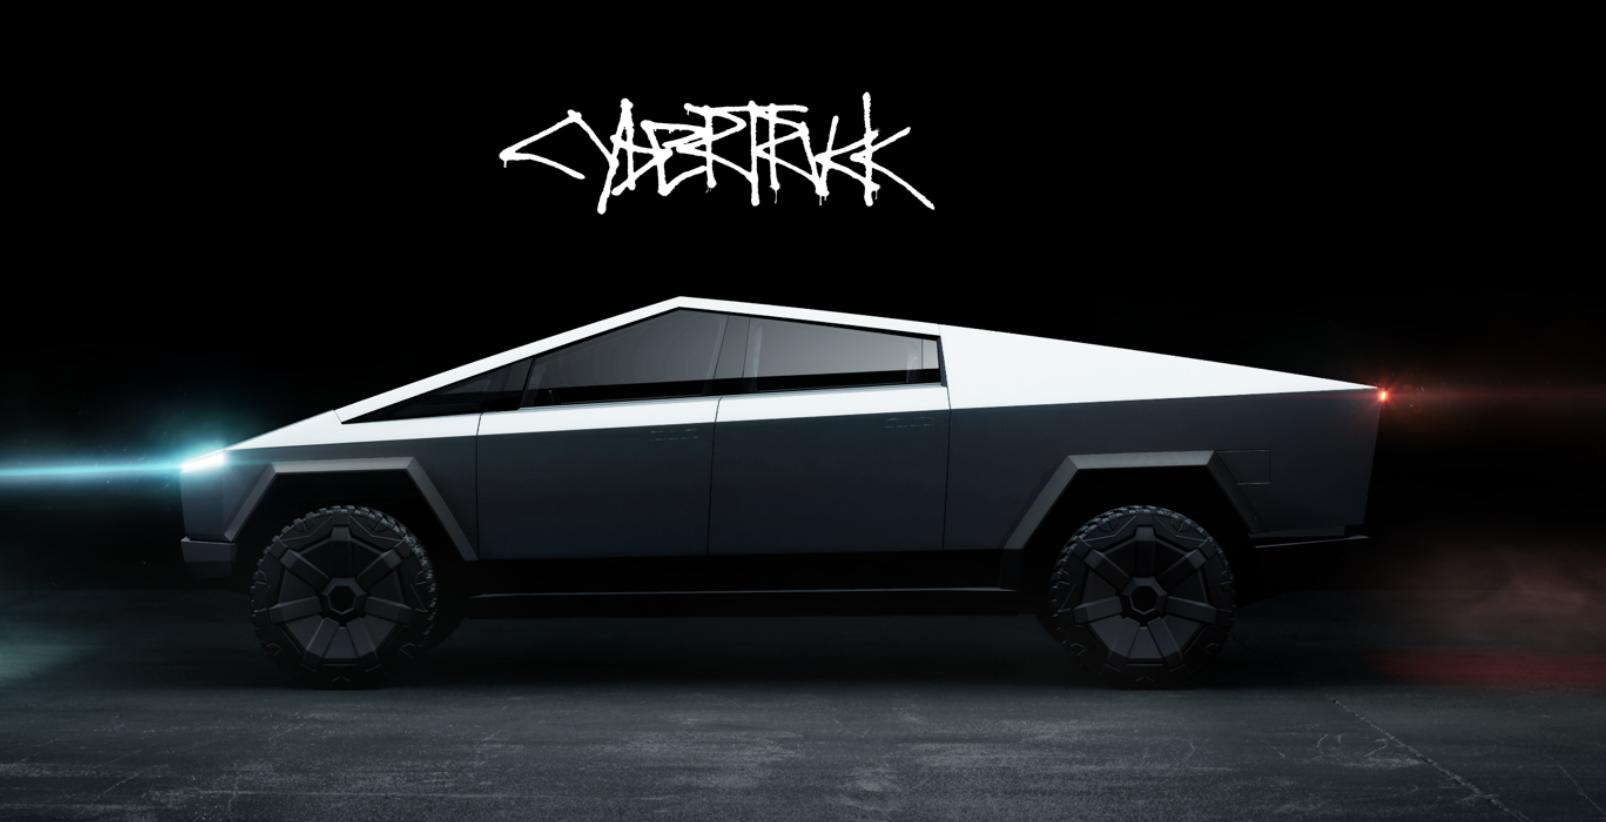 The Tesla Cybertruck S Graffiti Style Font Has Merchandise Written All Over It Top Speed Tesla Vehicles Electric Cars